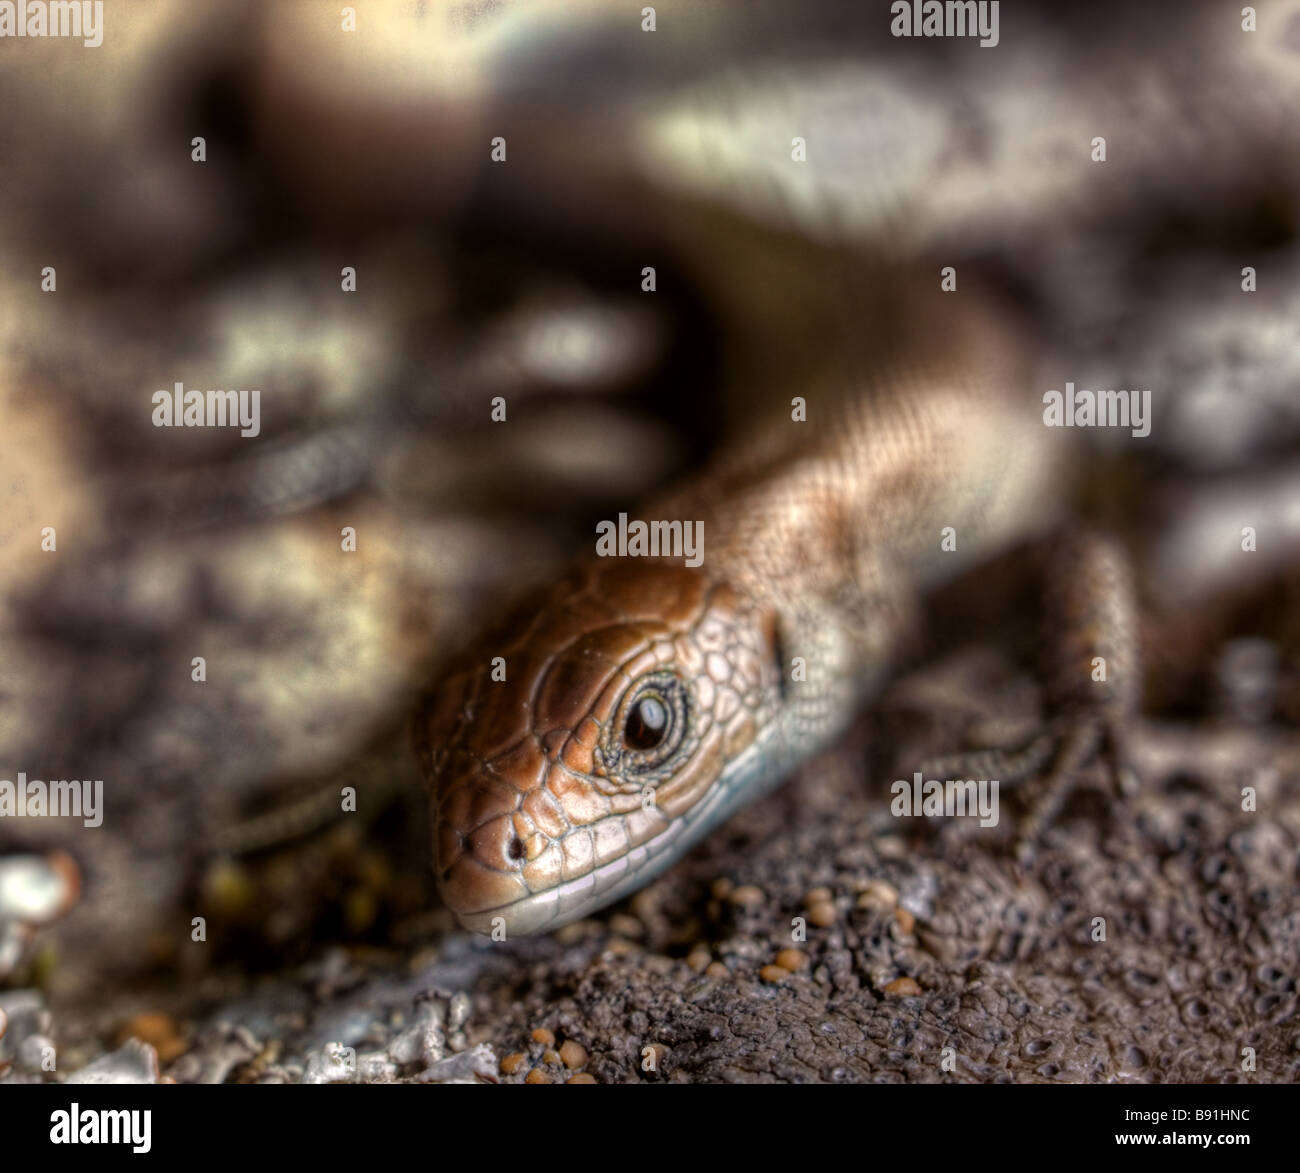 Yong common lizard looking at camera - Stock Image